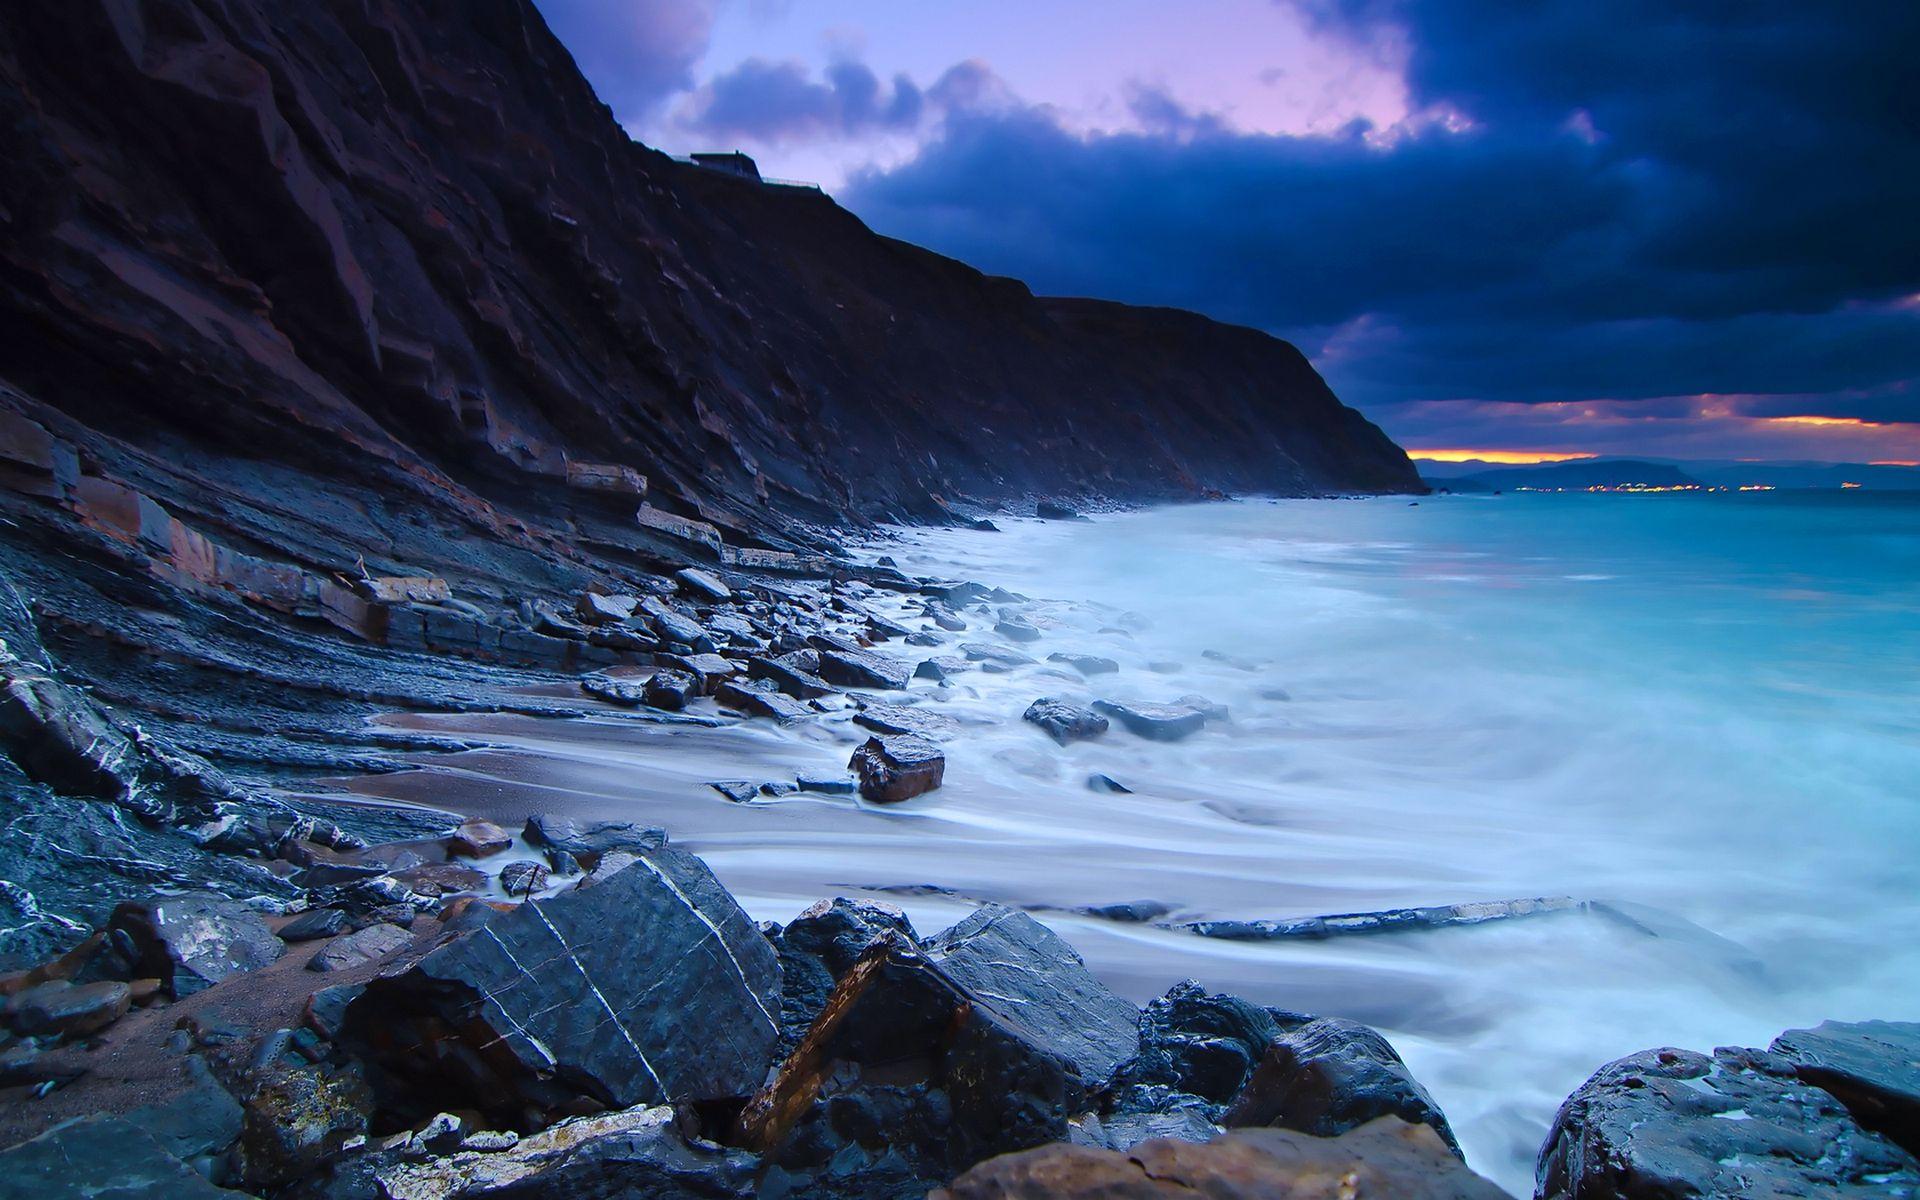 Rocky Beach Wallpaper Beach Wallpaper Beach Pictures Ocean Rocks